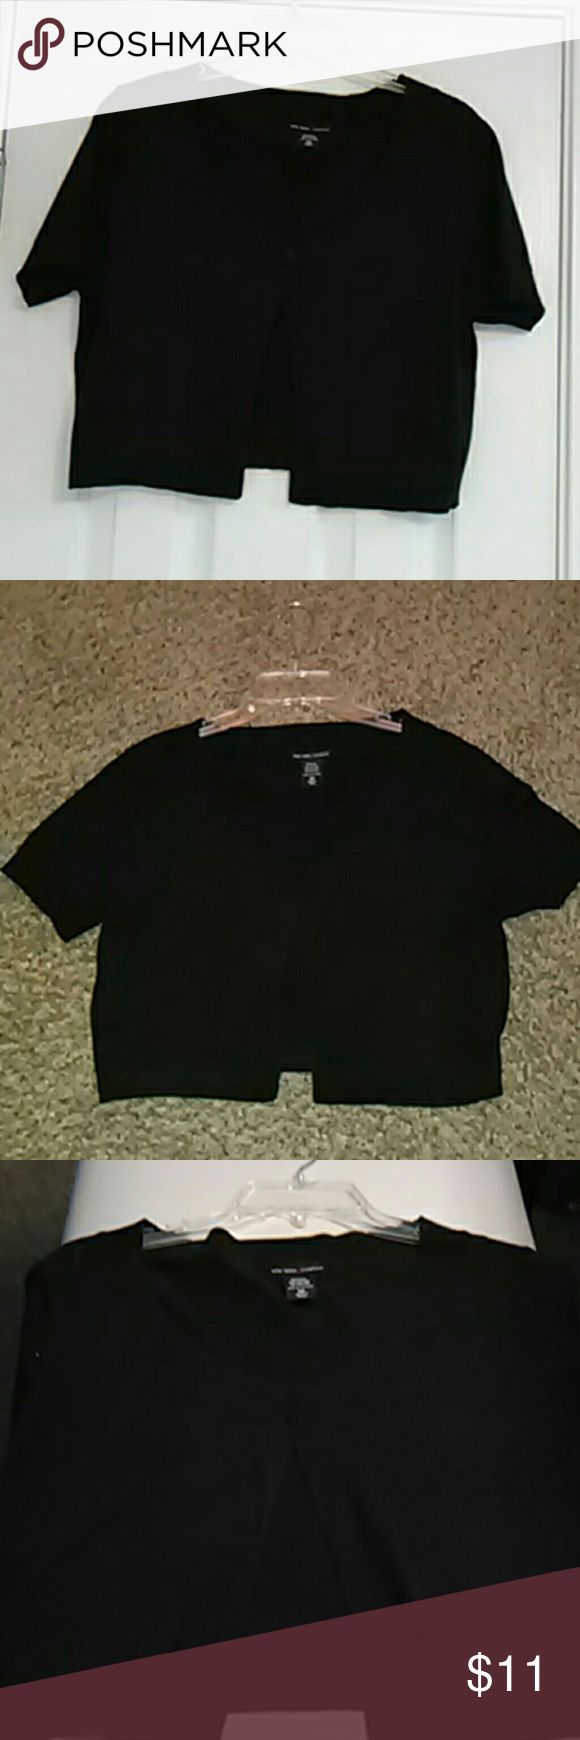 Ladies Cardigan Sweater Black short sleeve top New York & Company Tops